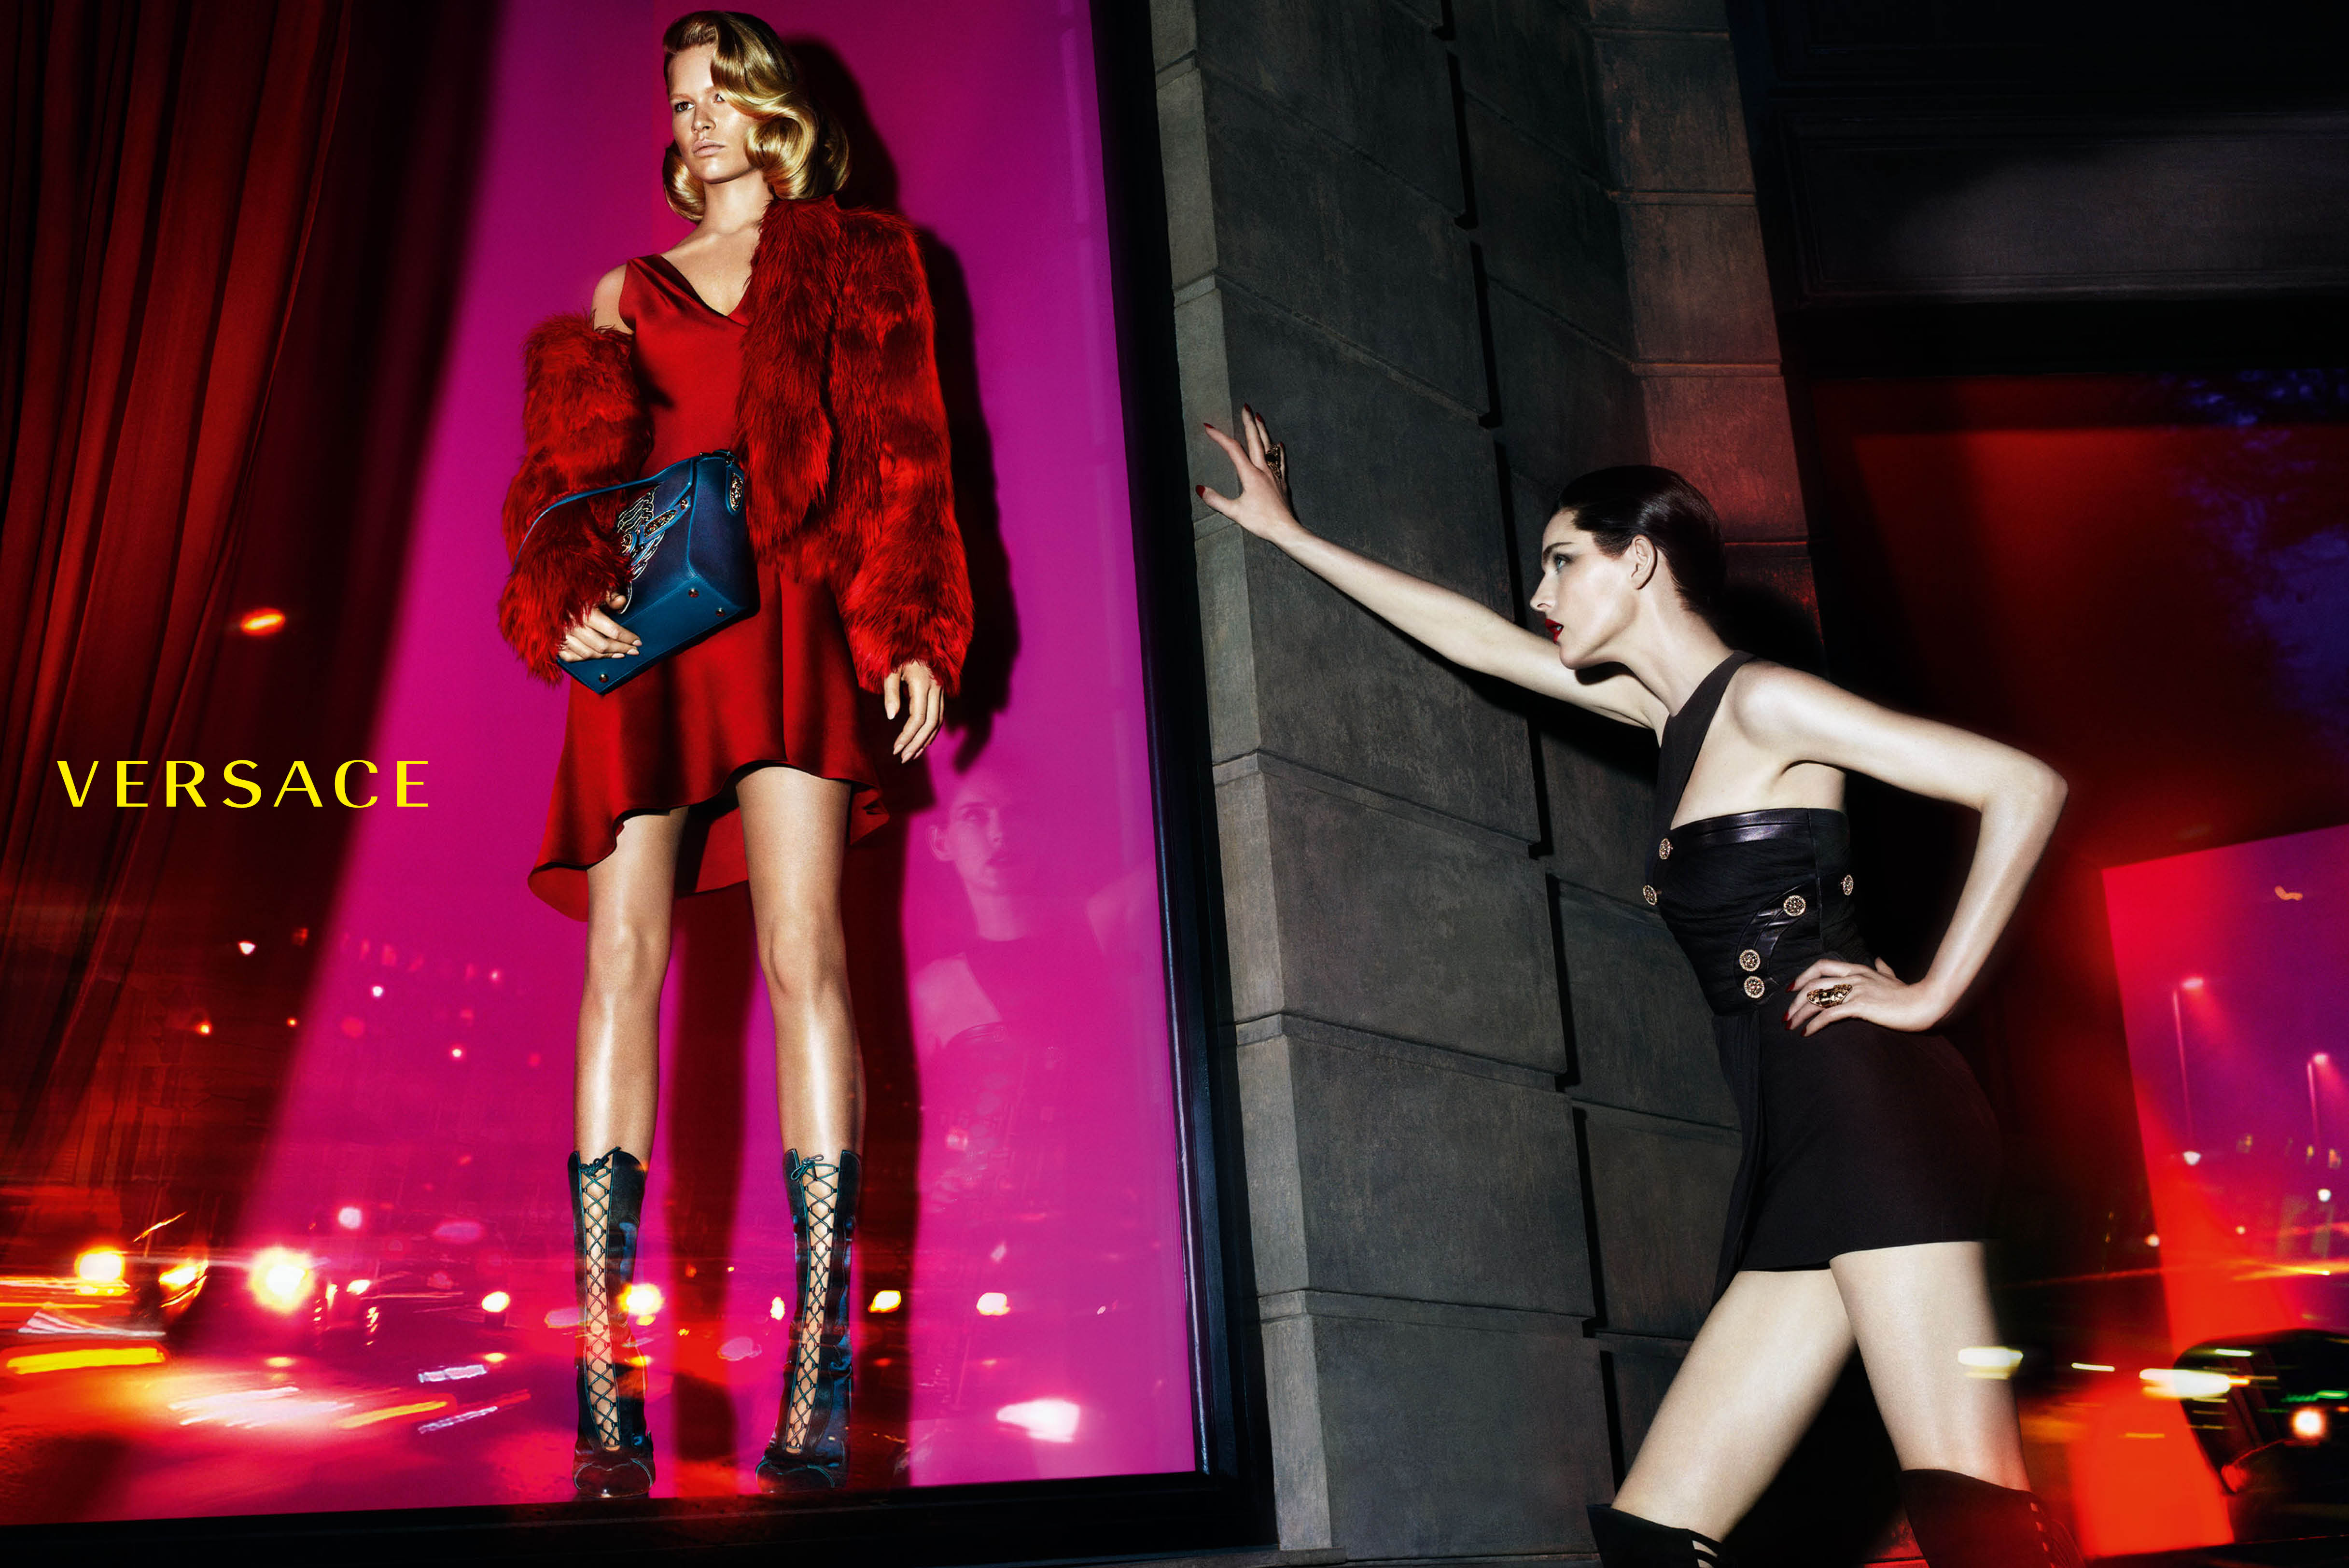 Versace-Fall-Winter-2014-1.jpg